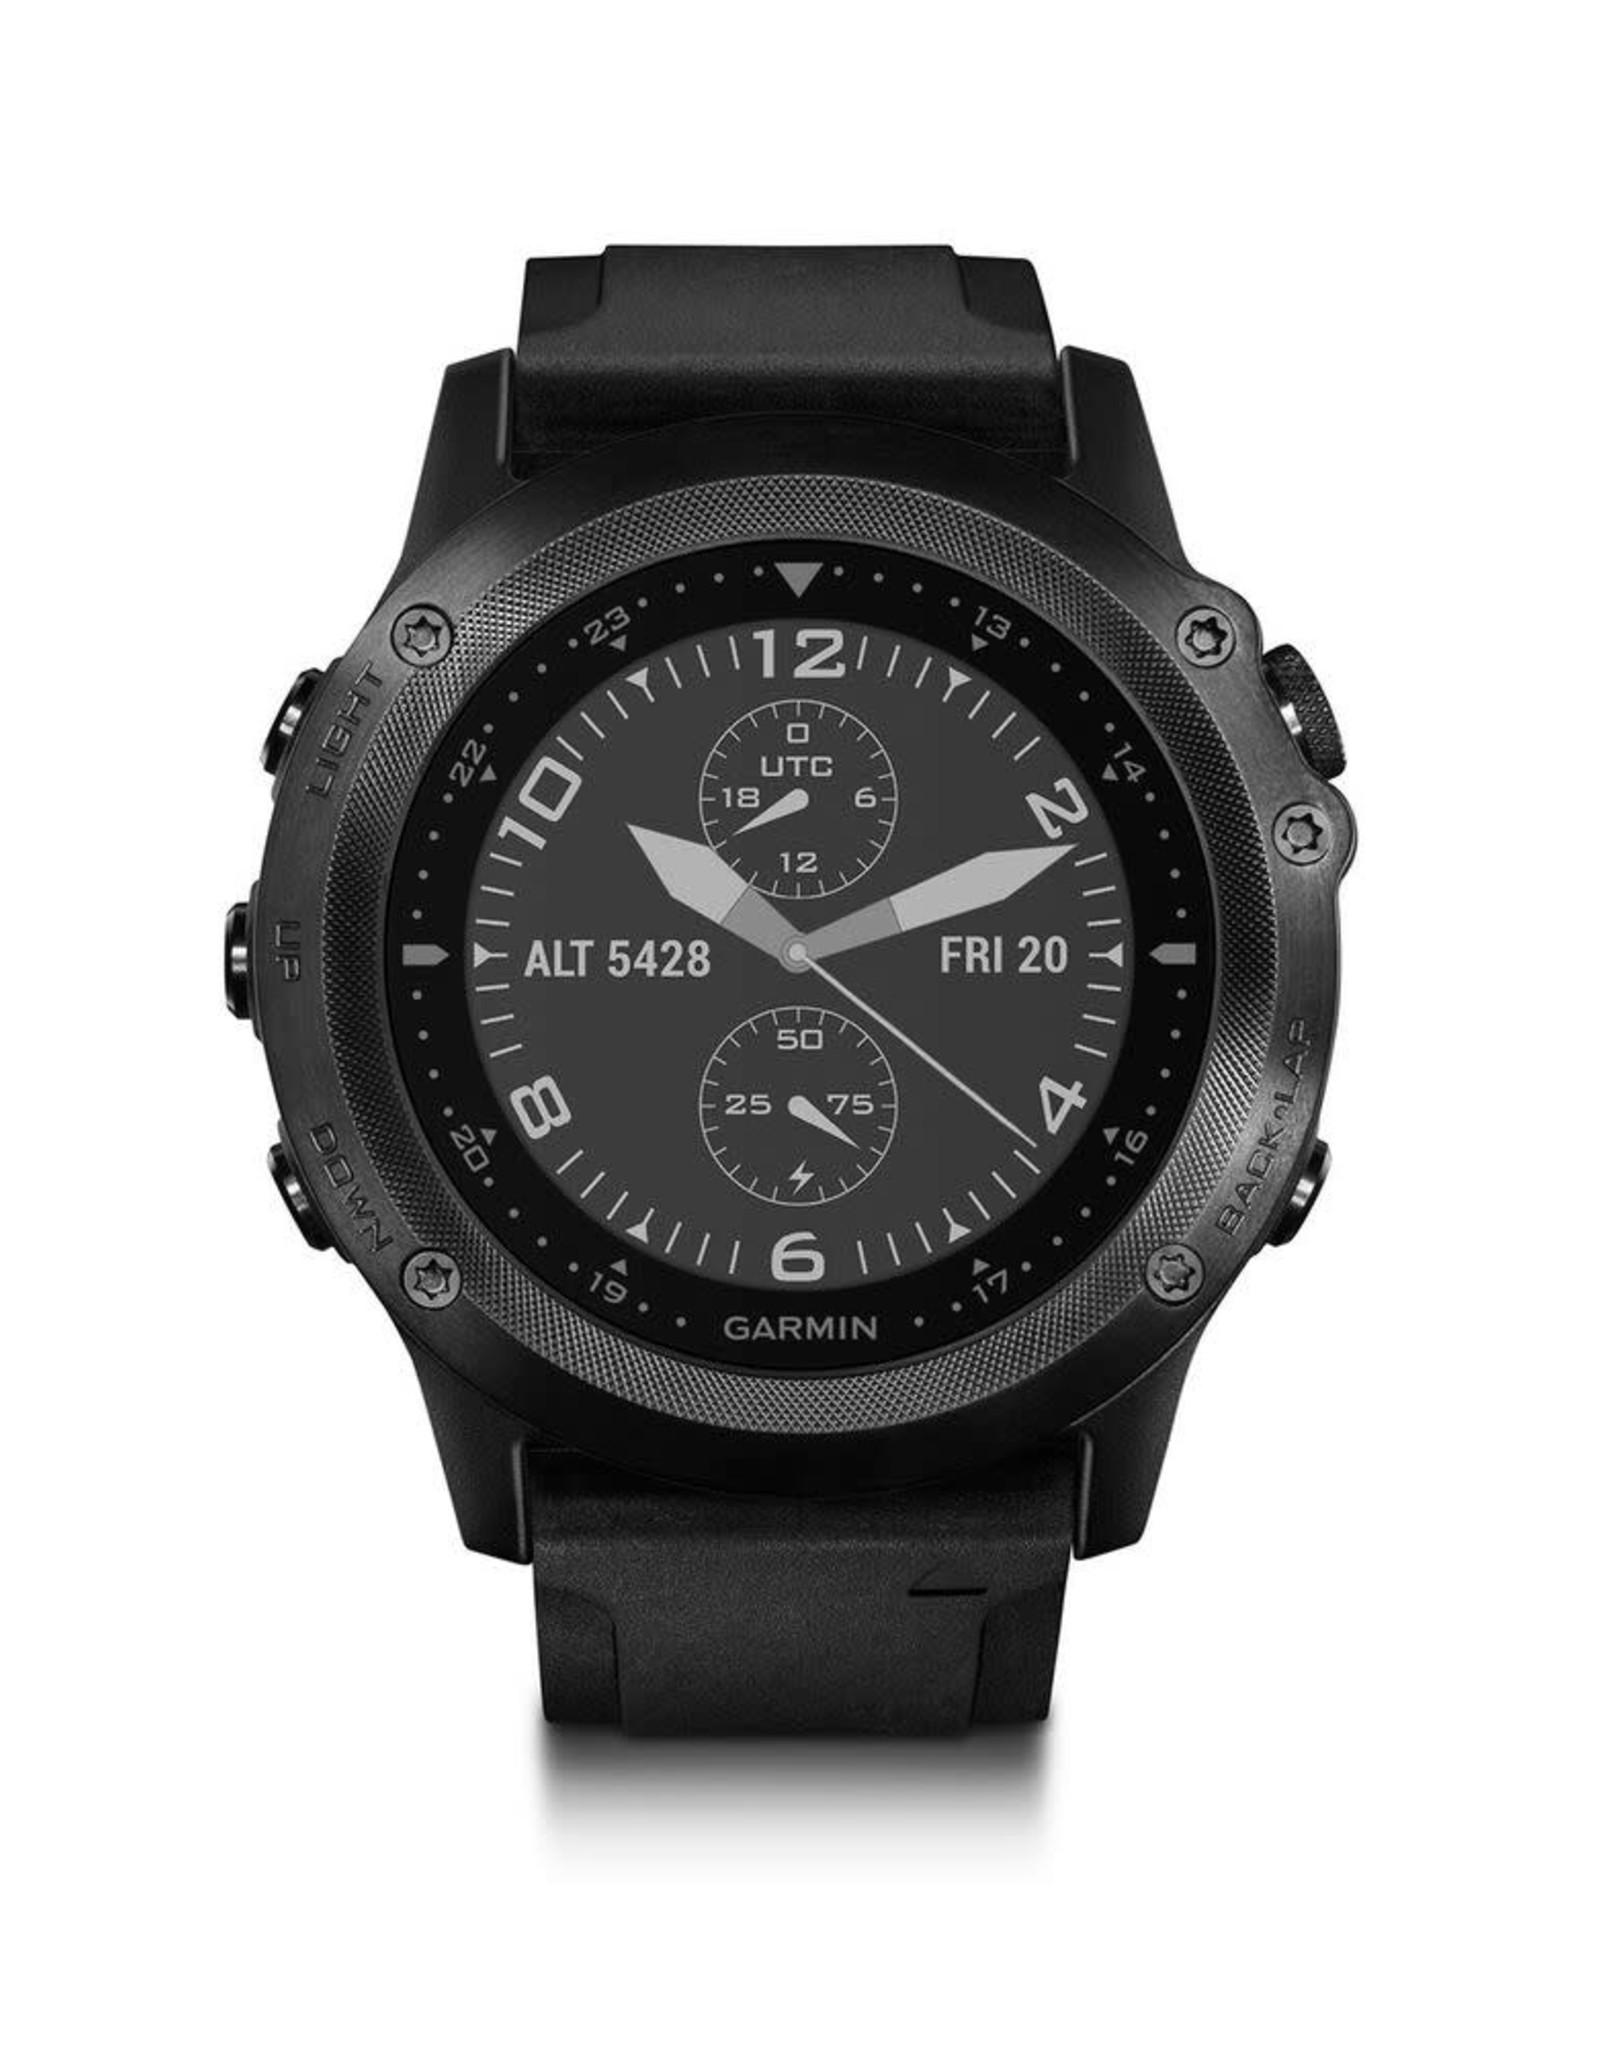 GARMIN Garmin, Tactix Bravo, Watch only, Black with black silicone strap, 010-01338-0C